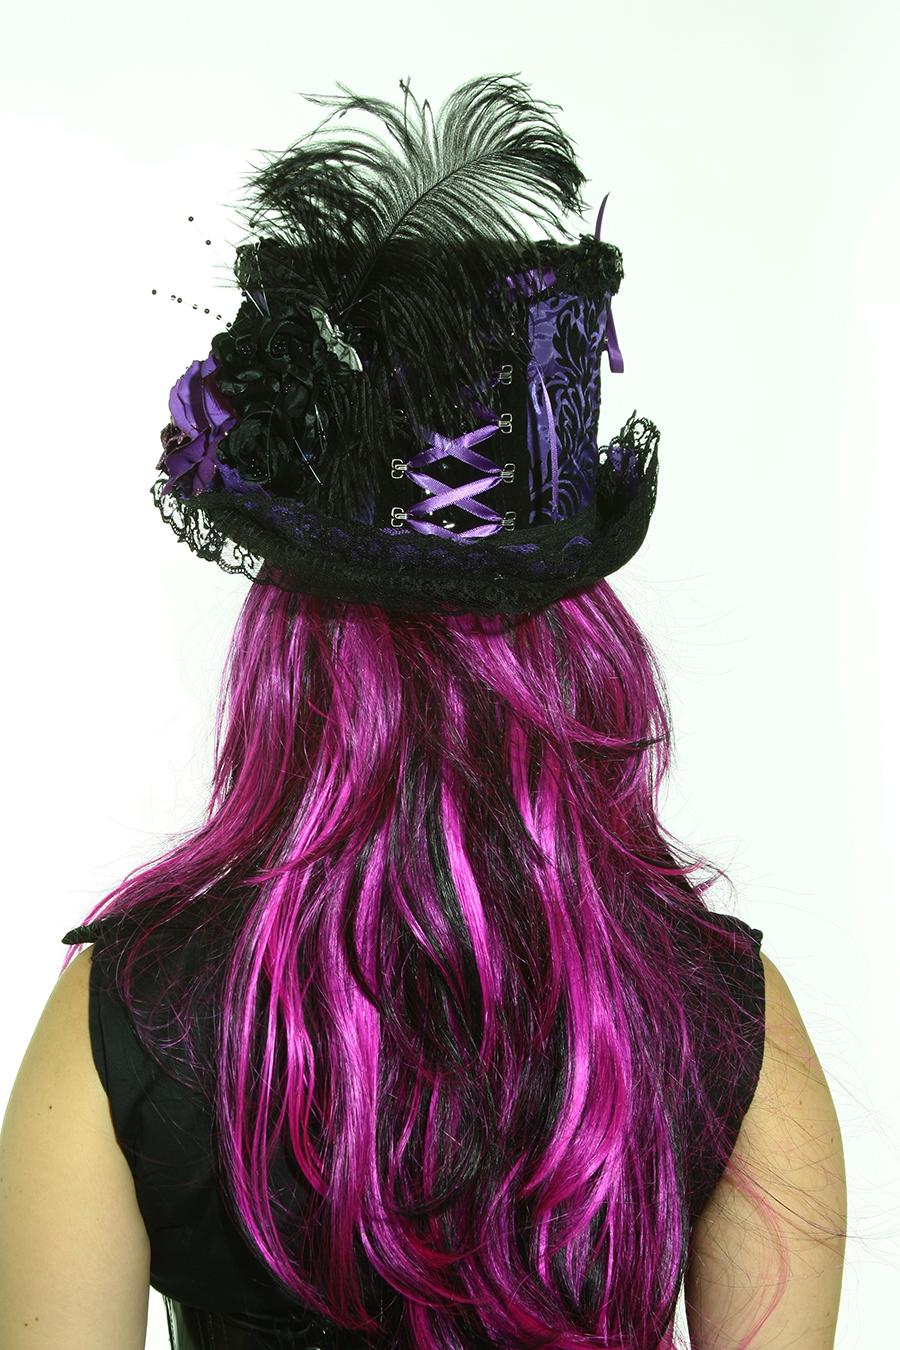 damask_big_top_hat_purple_hats_and_caps_2.jpg